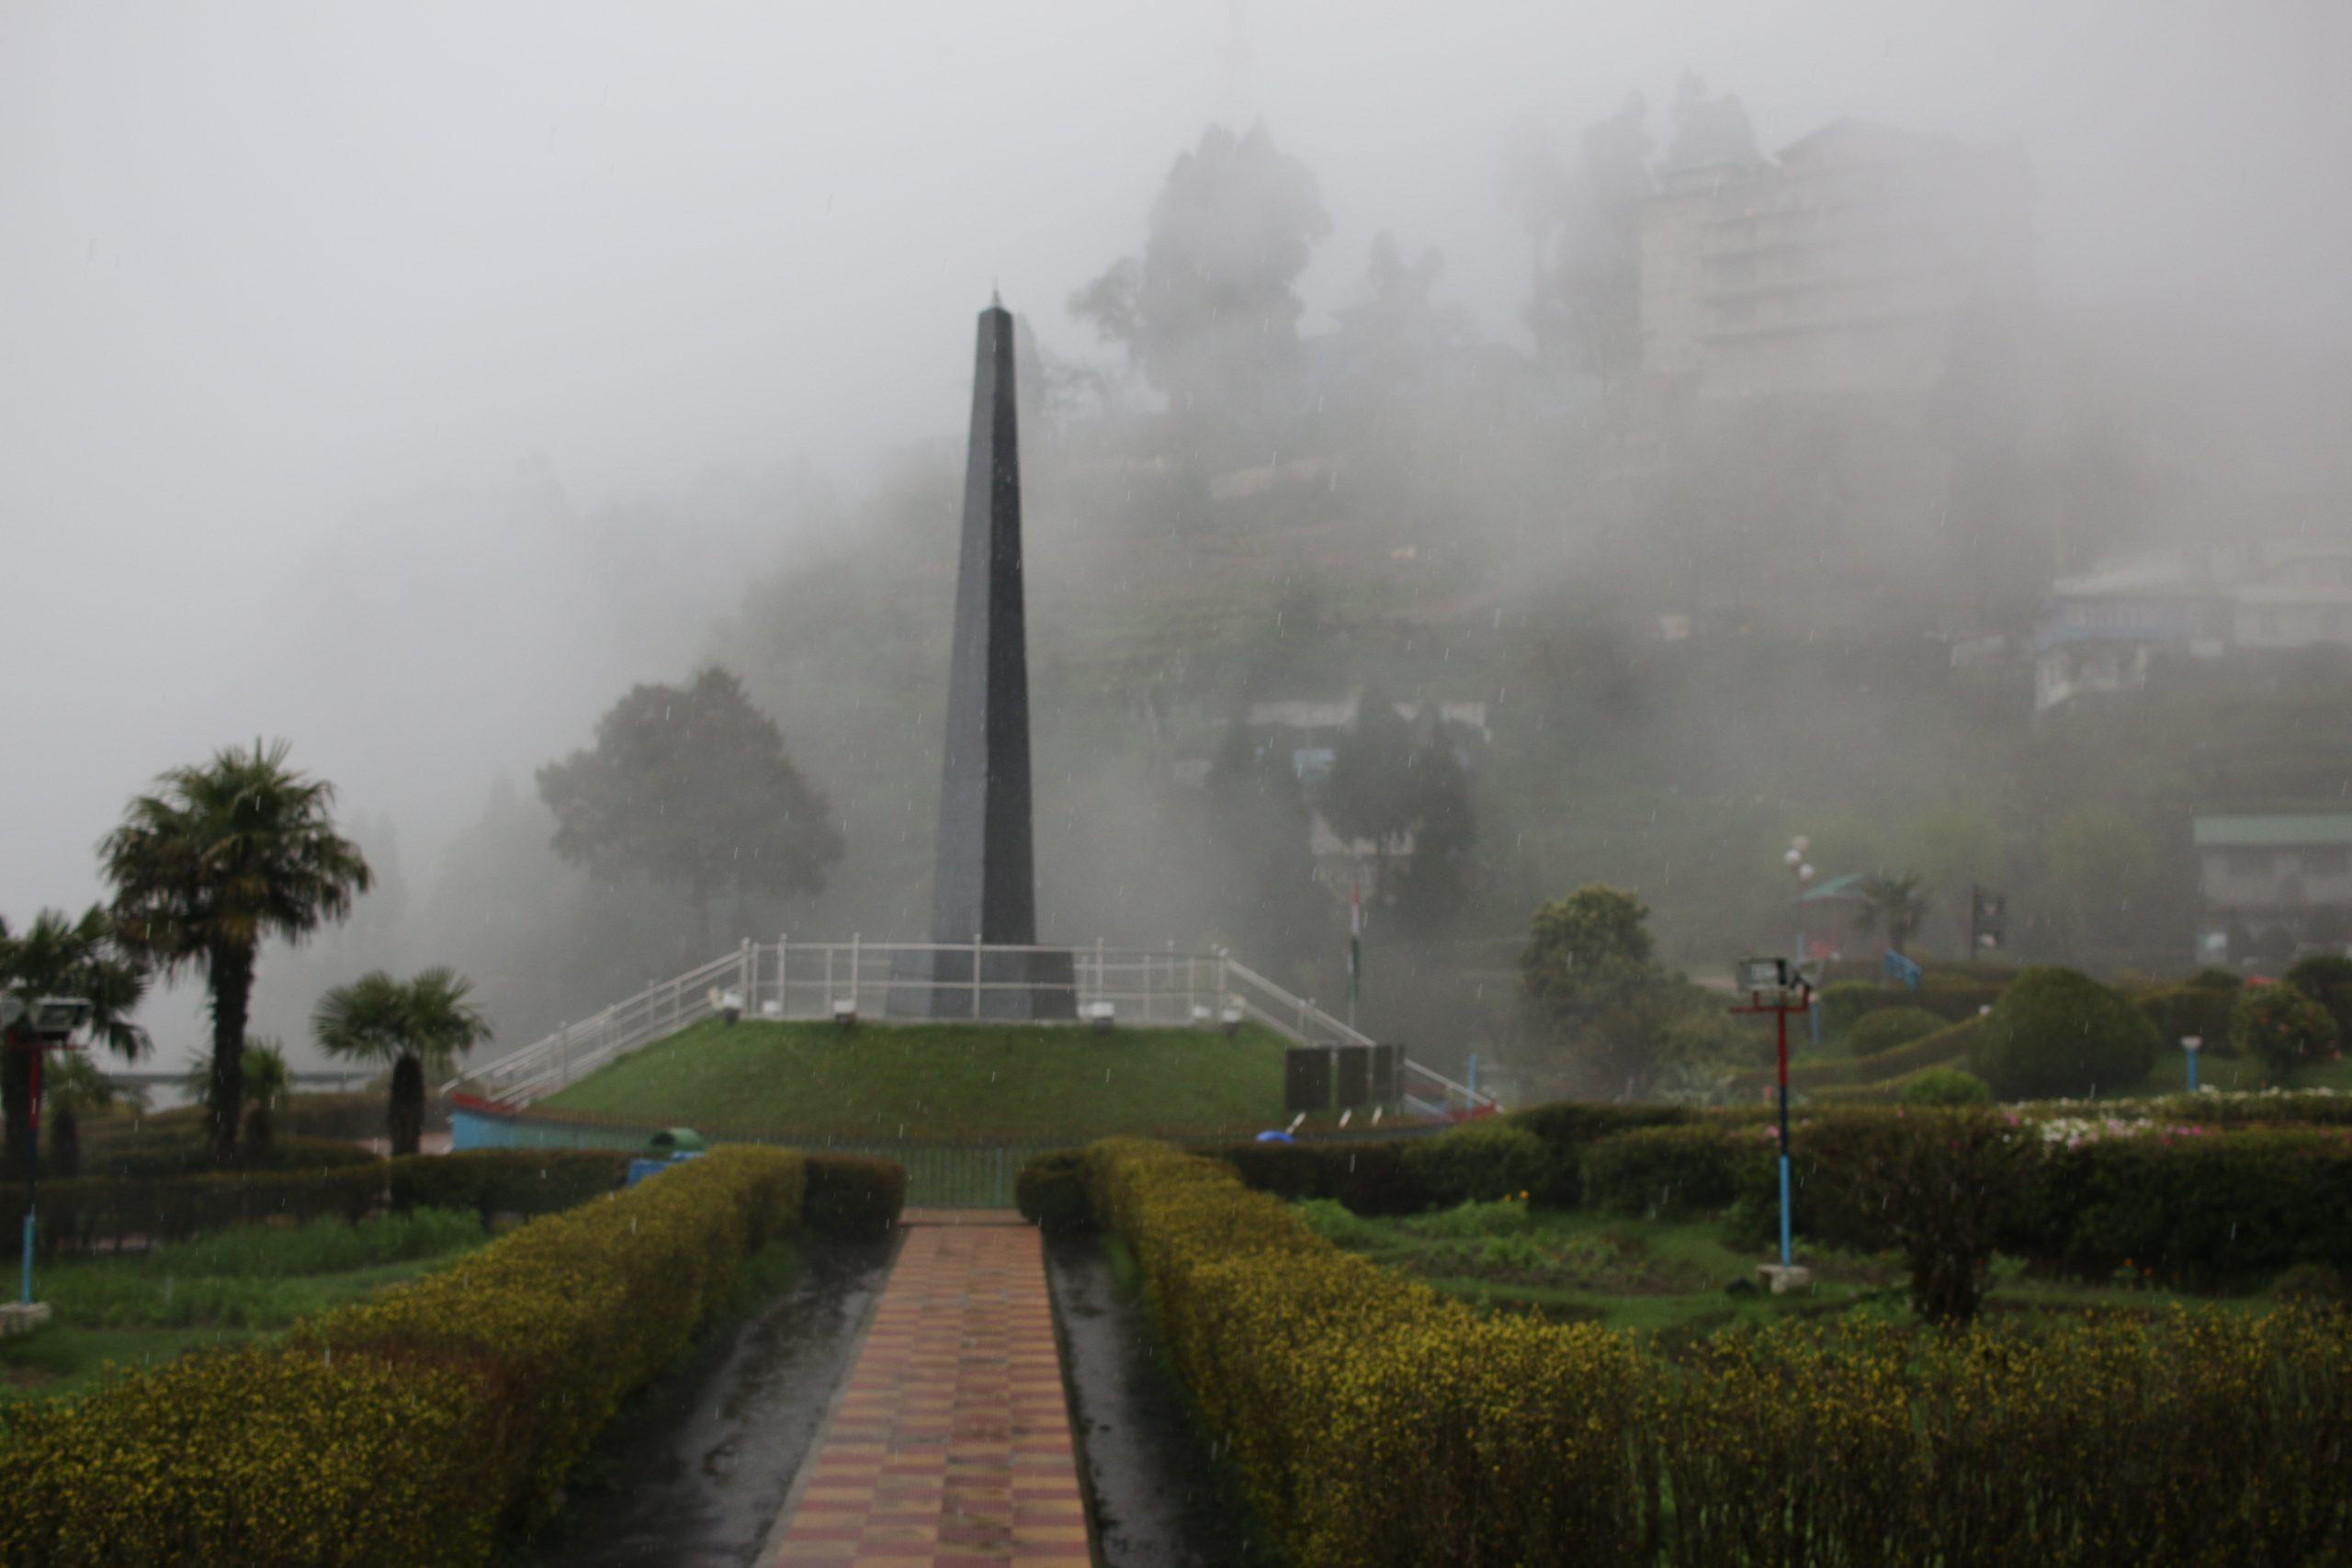 cloudy day at war memorial